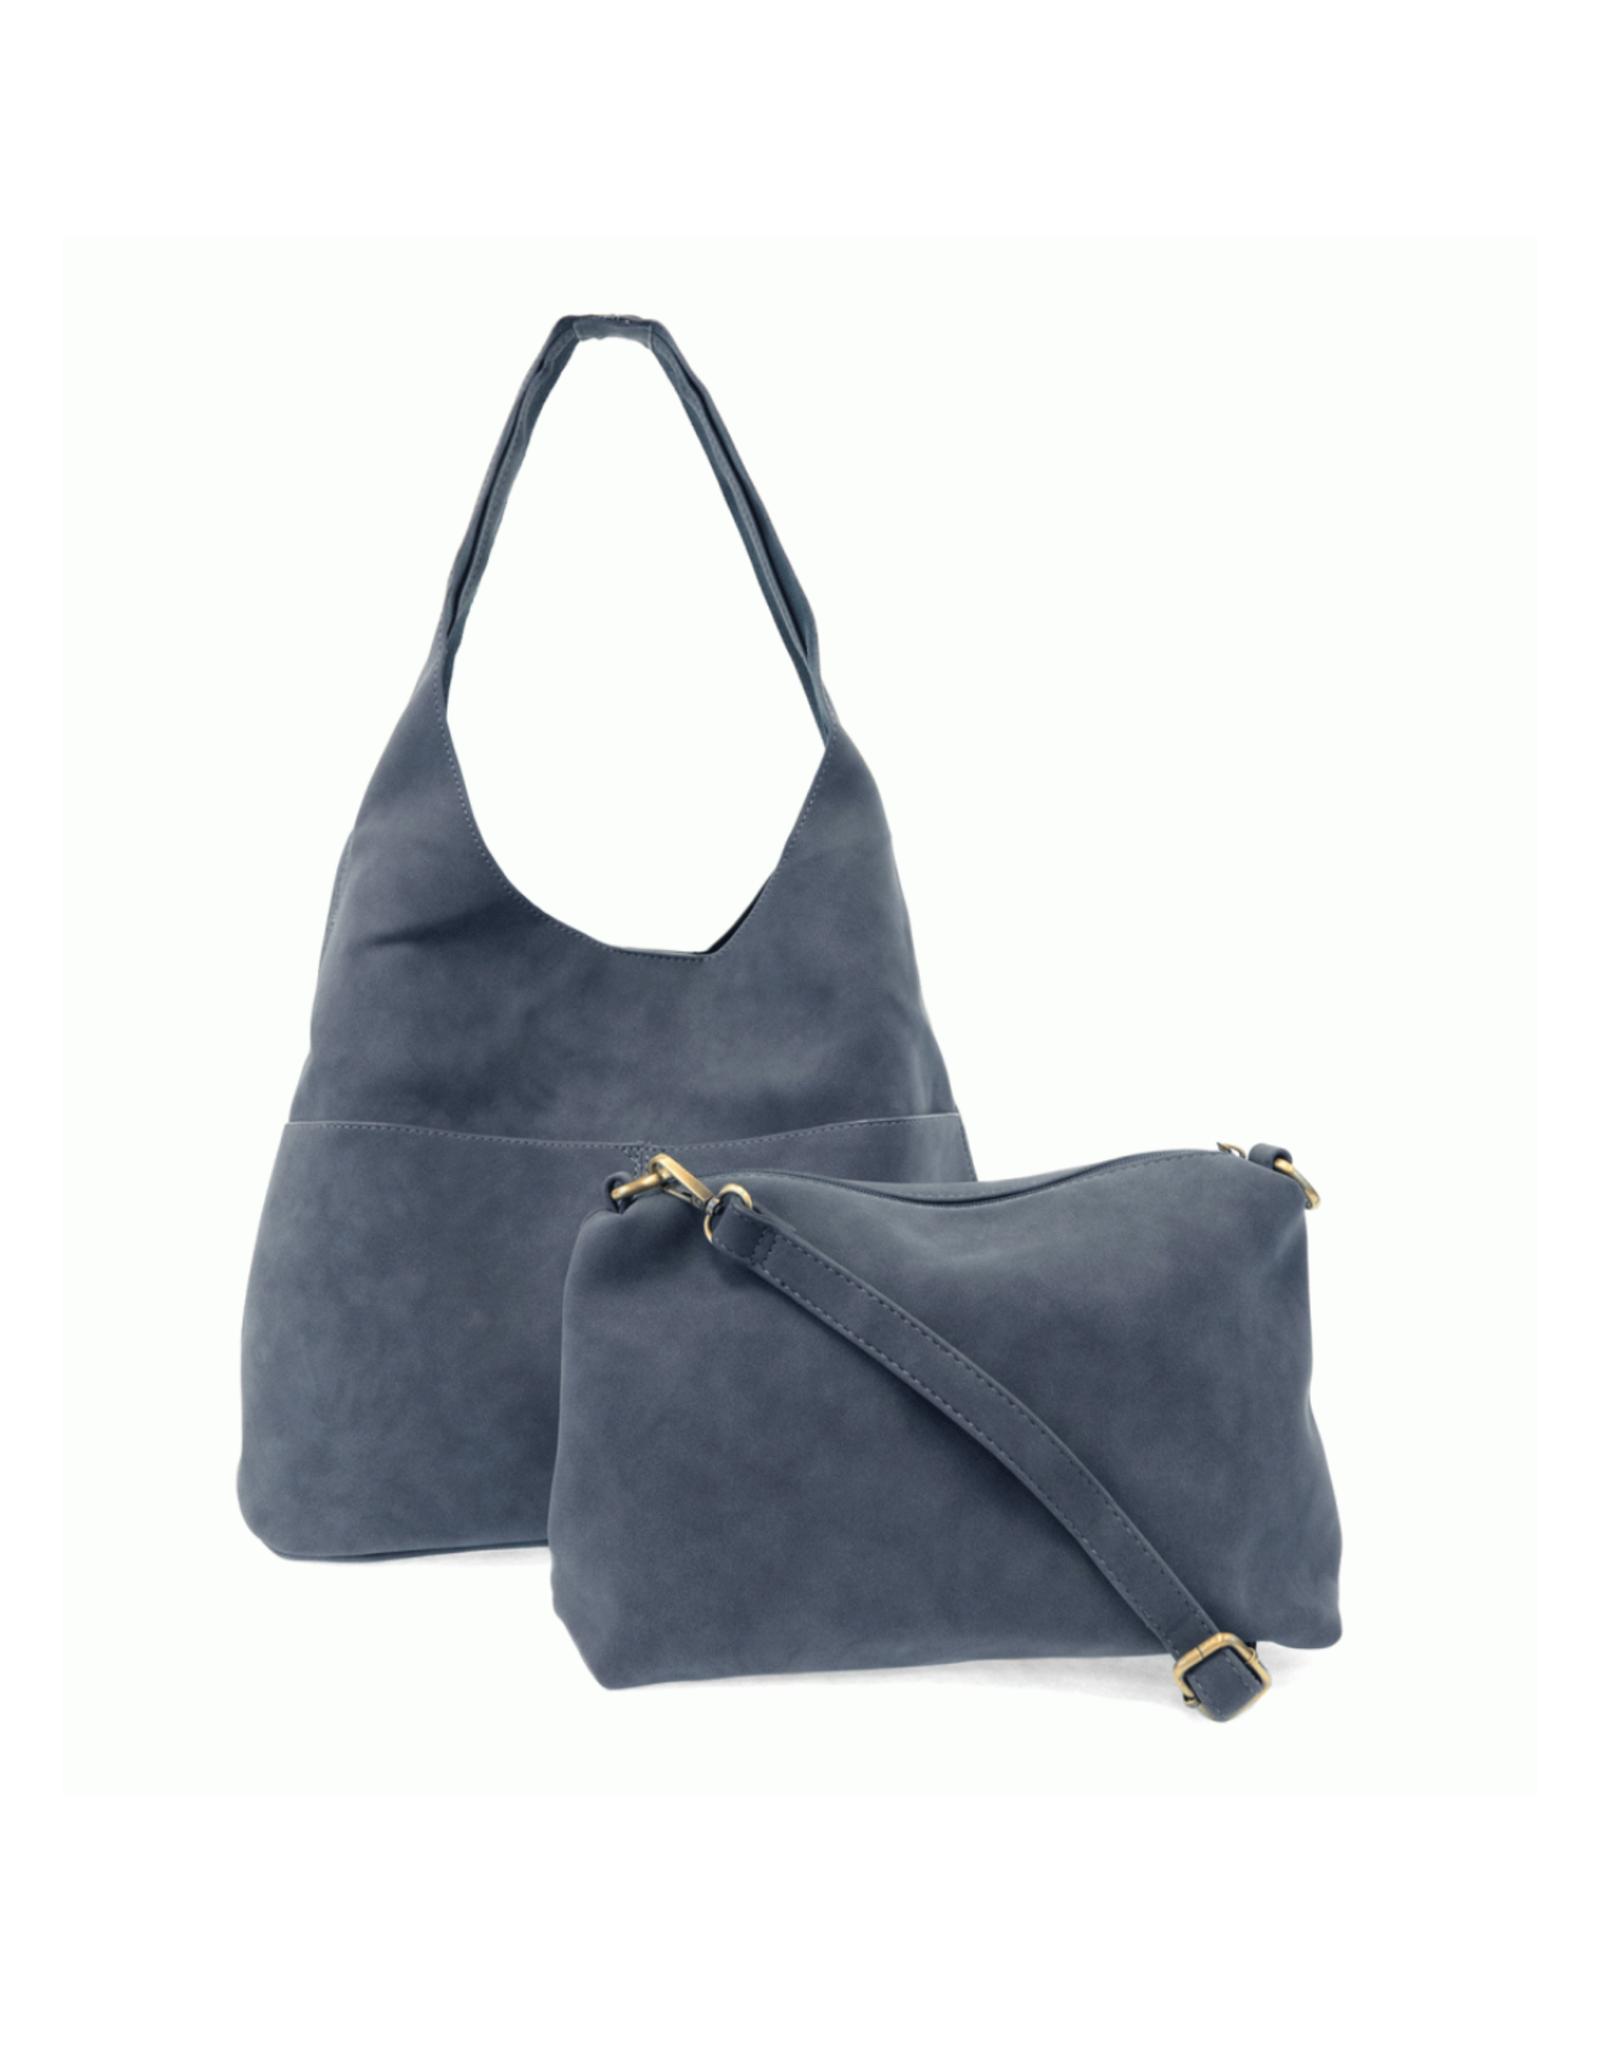 Jenny Suede Hobo Handbag : Marine